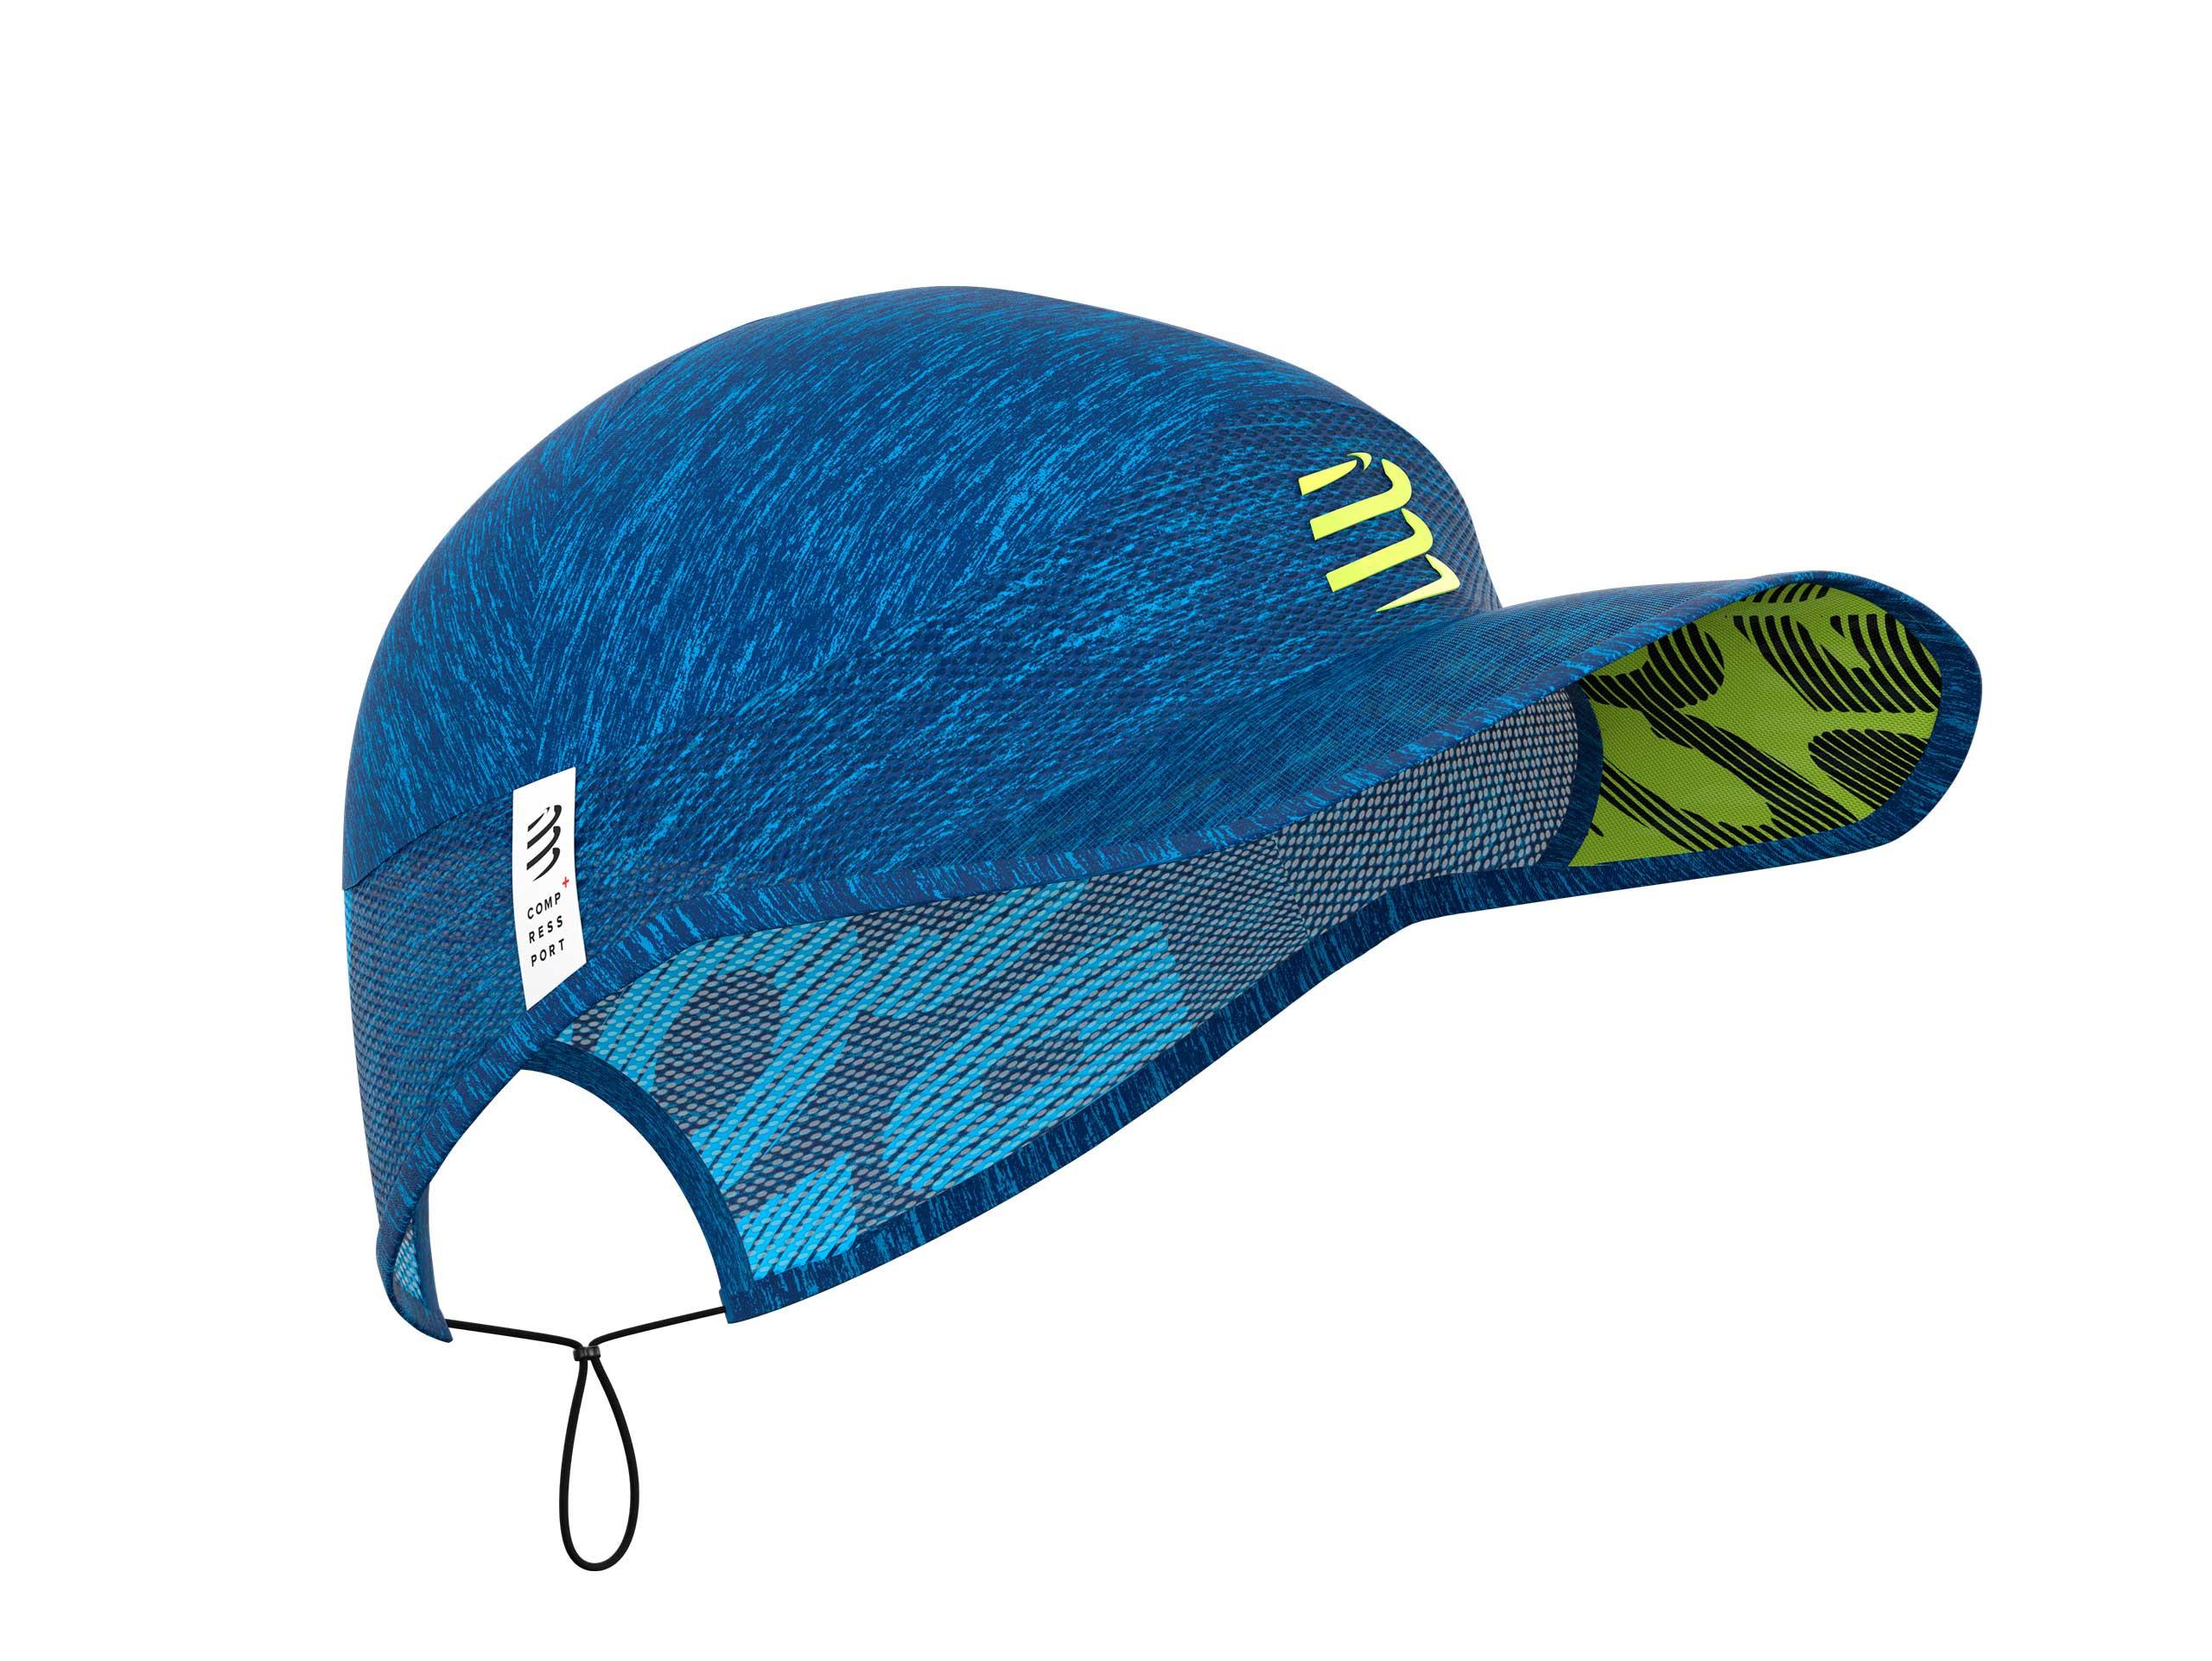 Gorra Pro Racing azul jaspeado